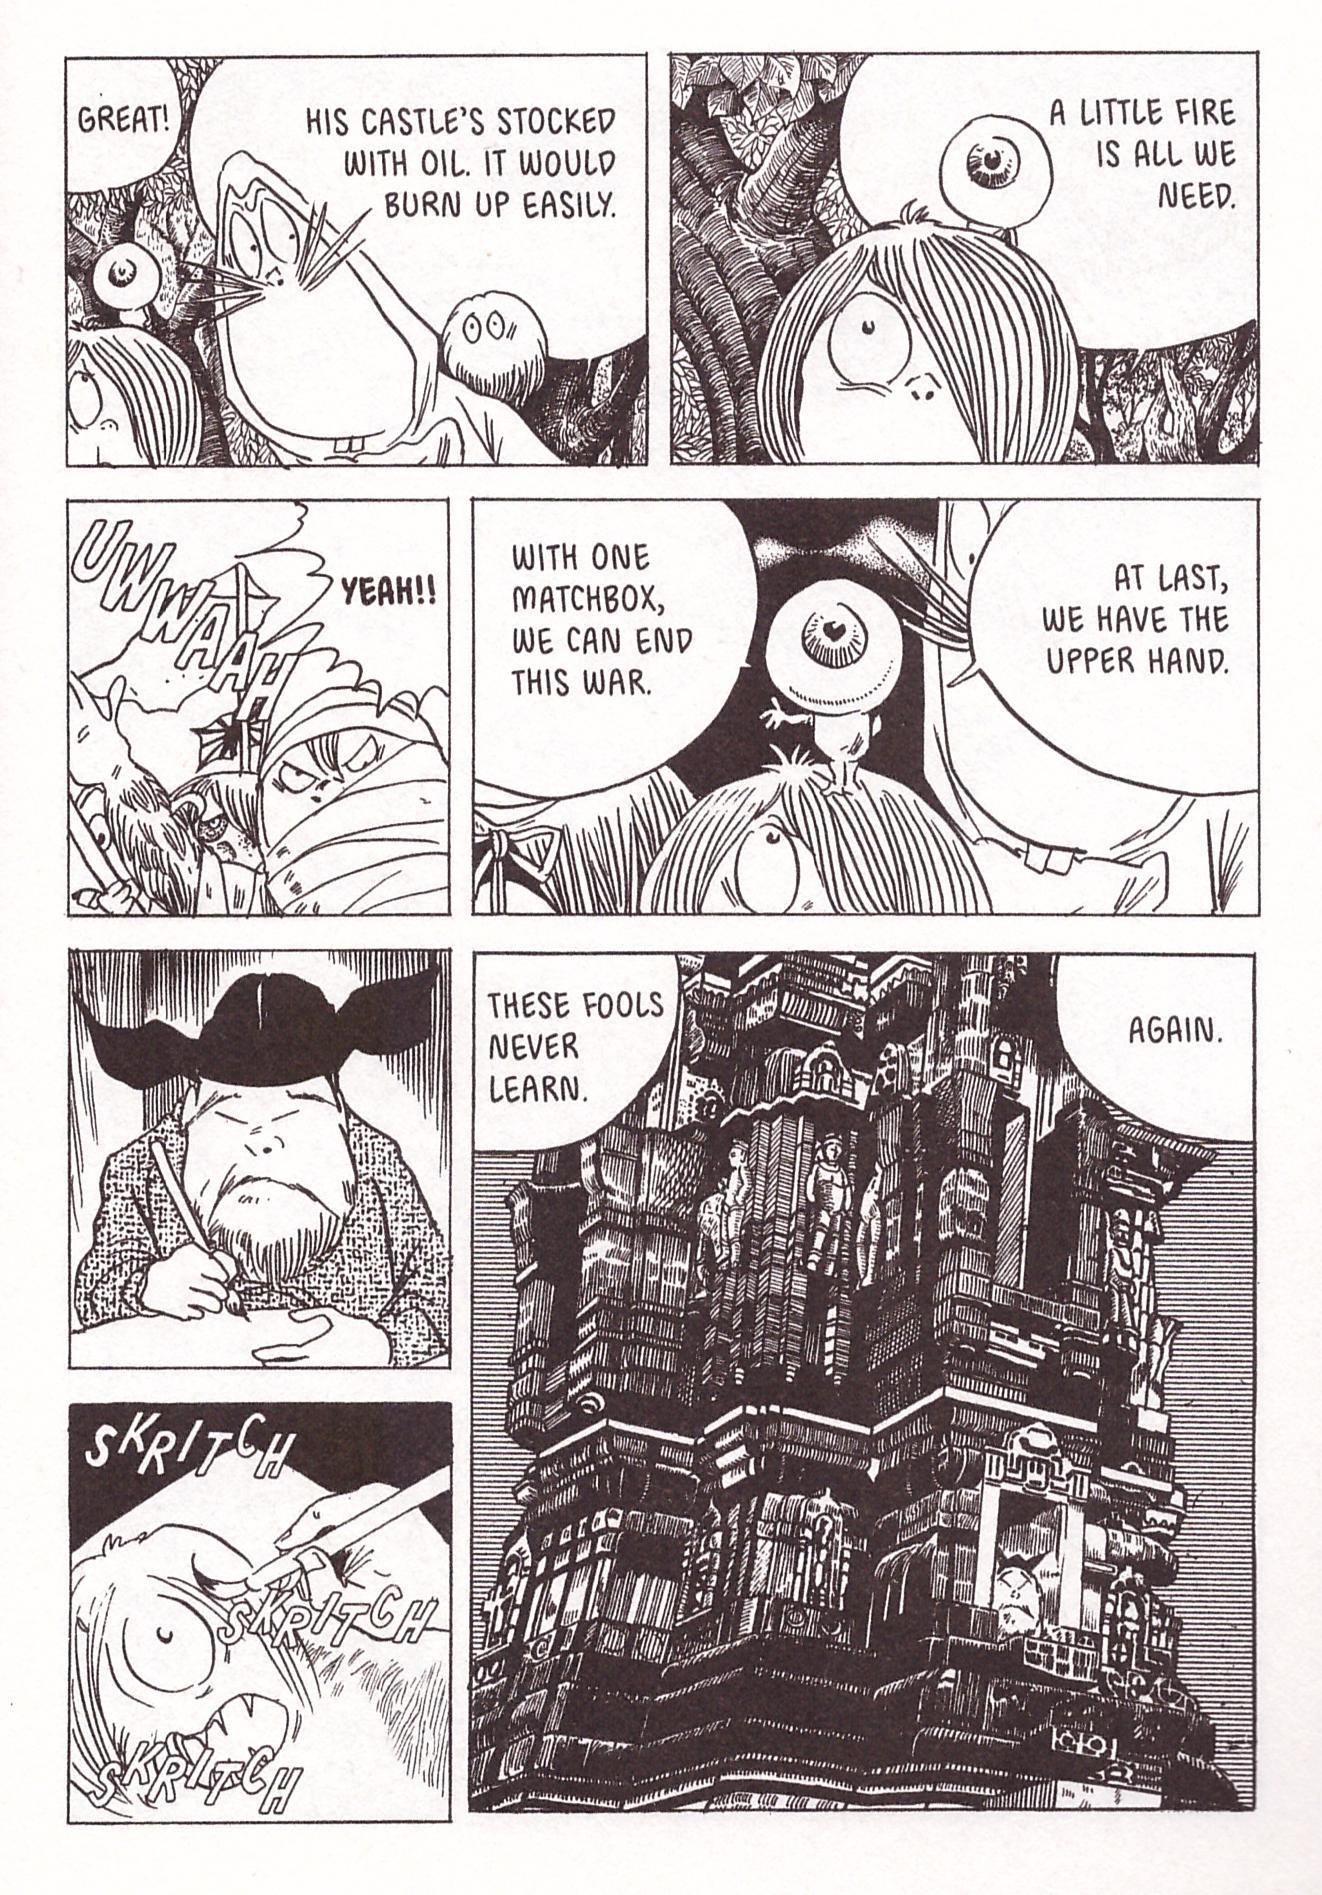 Kitaro's Strange Adventures review